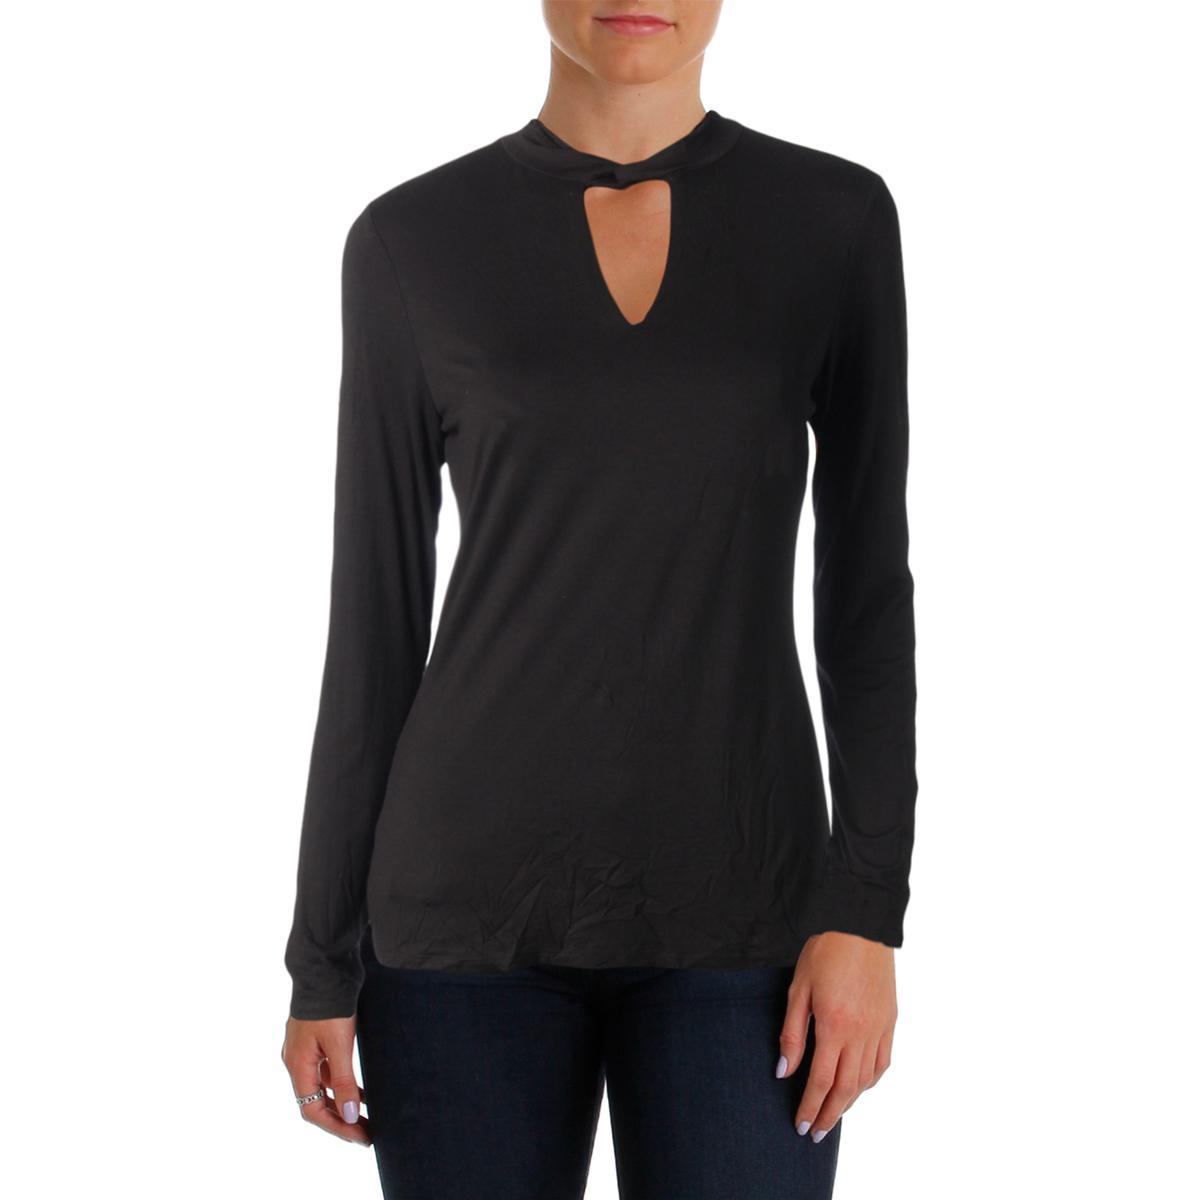 e684017df Details about INC Womens Black Mock Neck Lightweight Long Sleeves Casual  Top Shirt L BHFO 4465